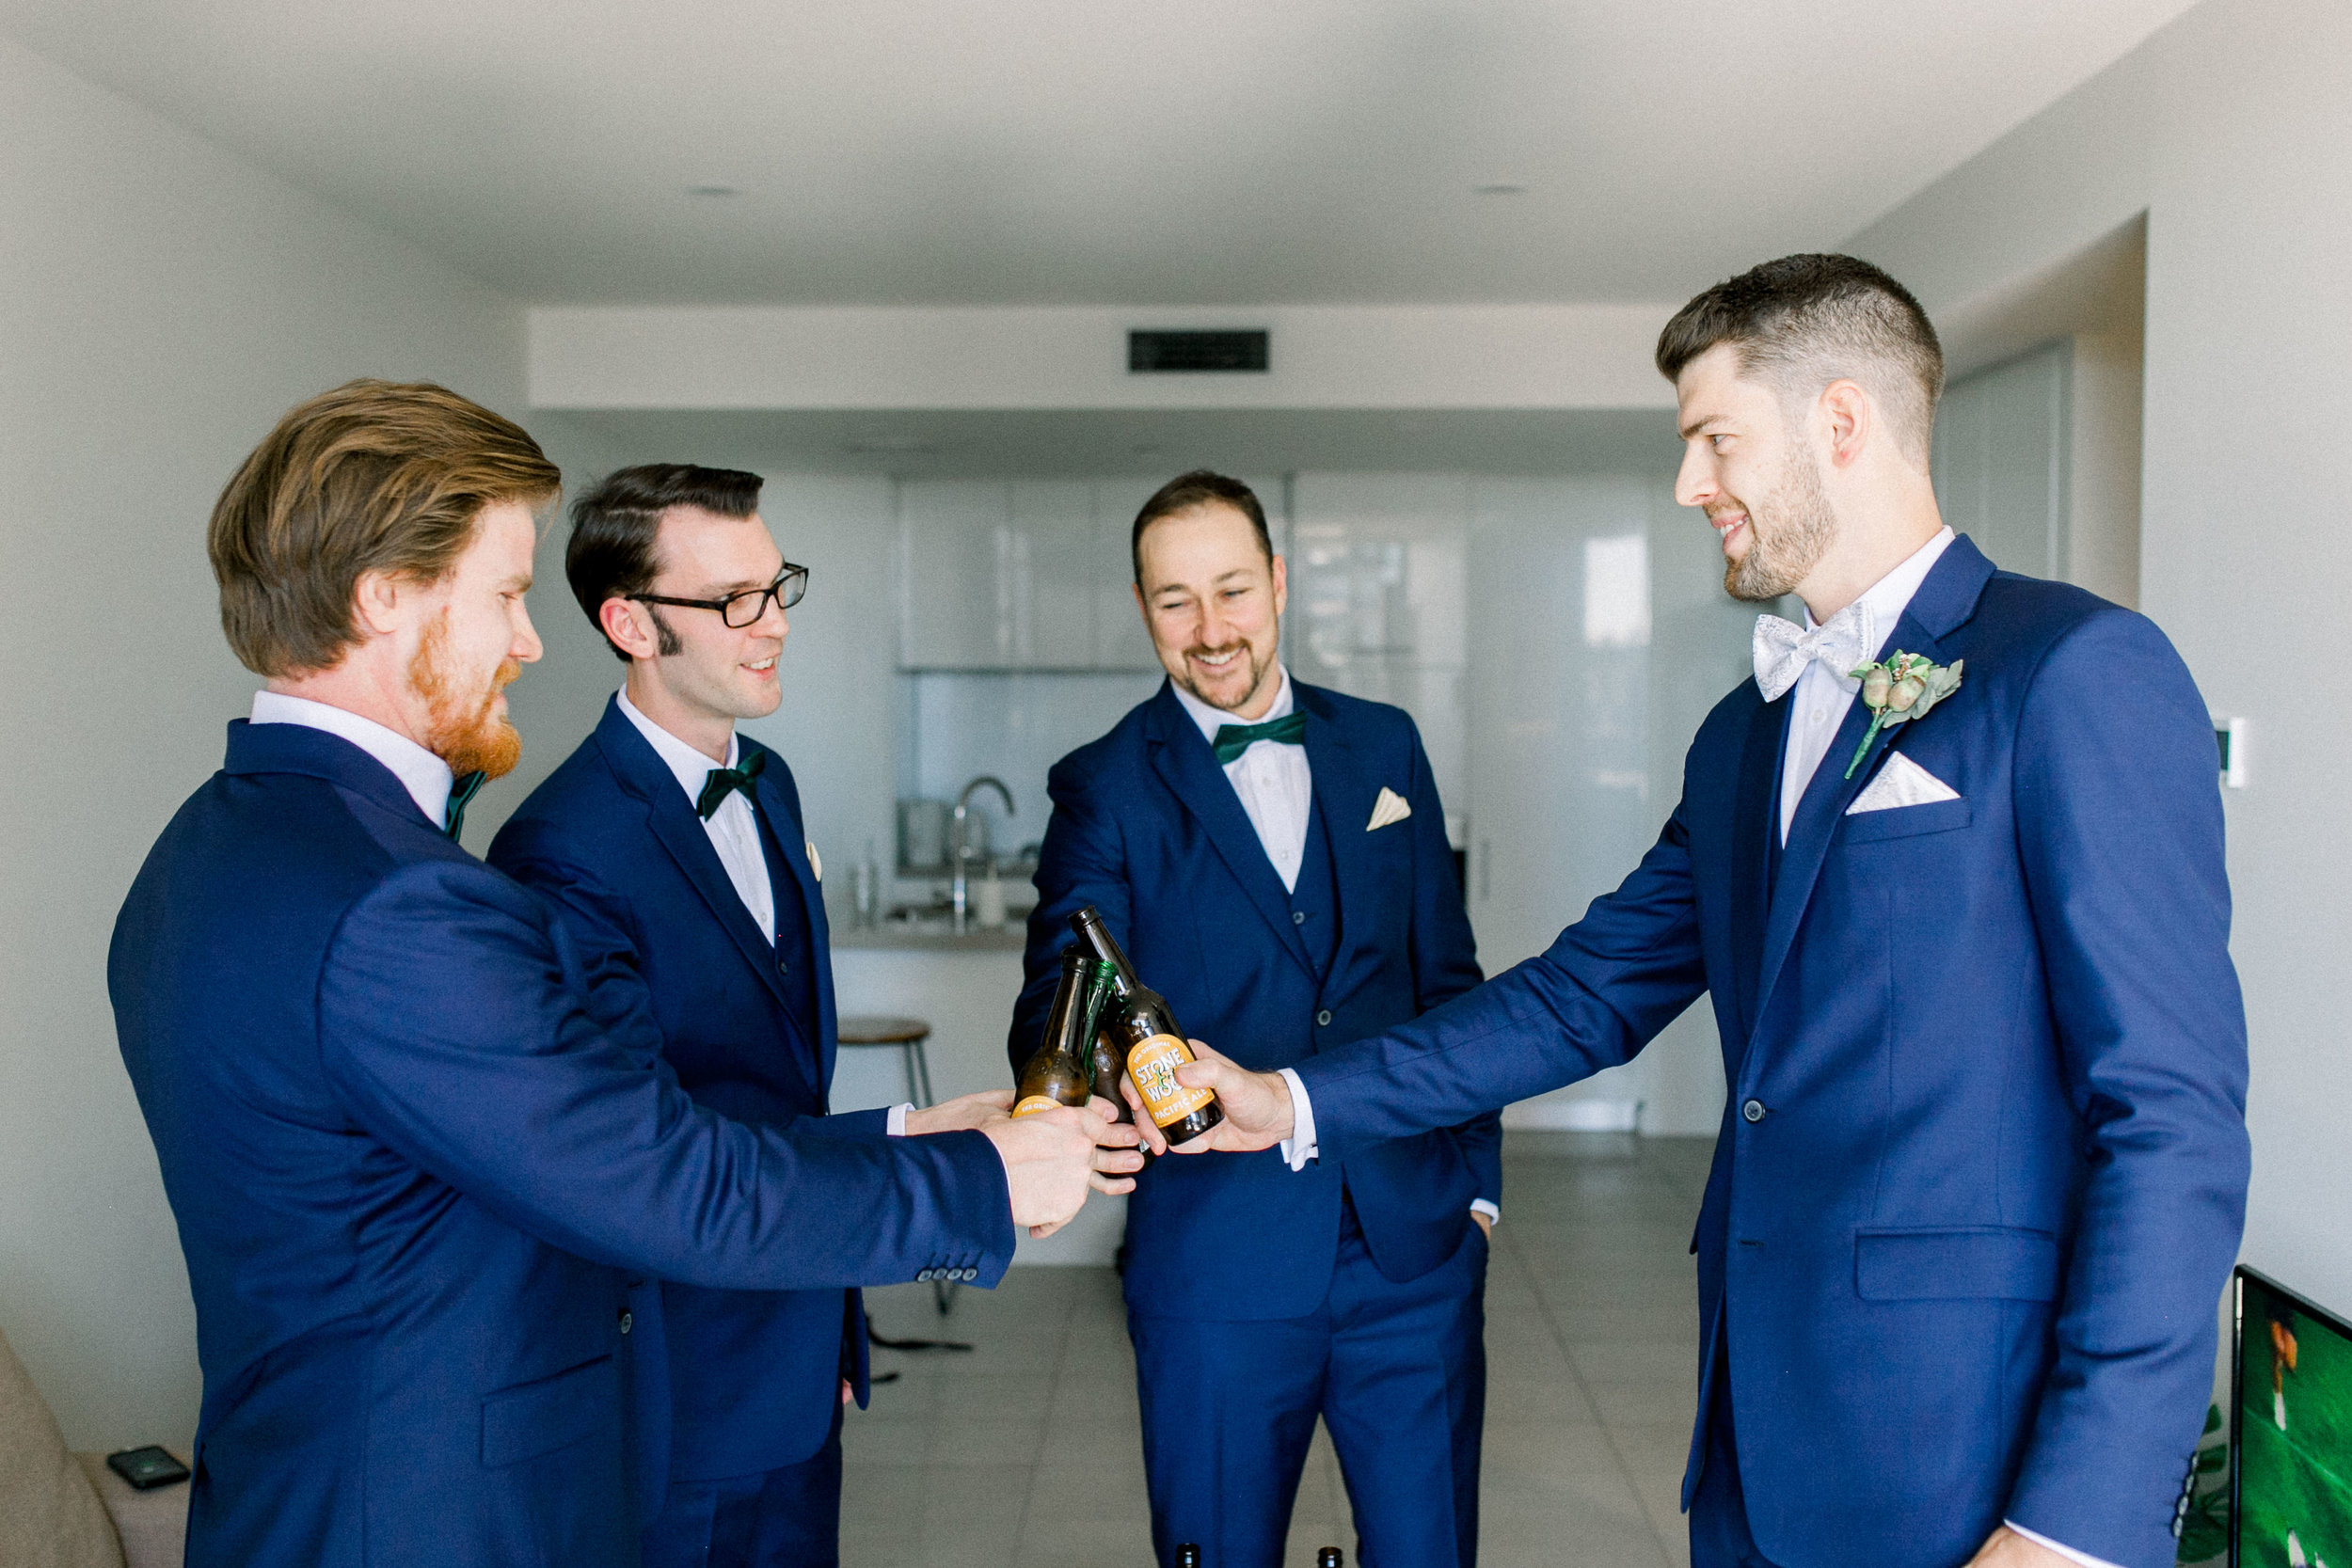 brisbane-city-wedding-photography-the-loft-1-16.jpg